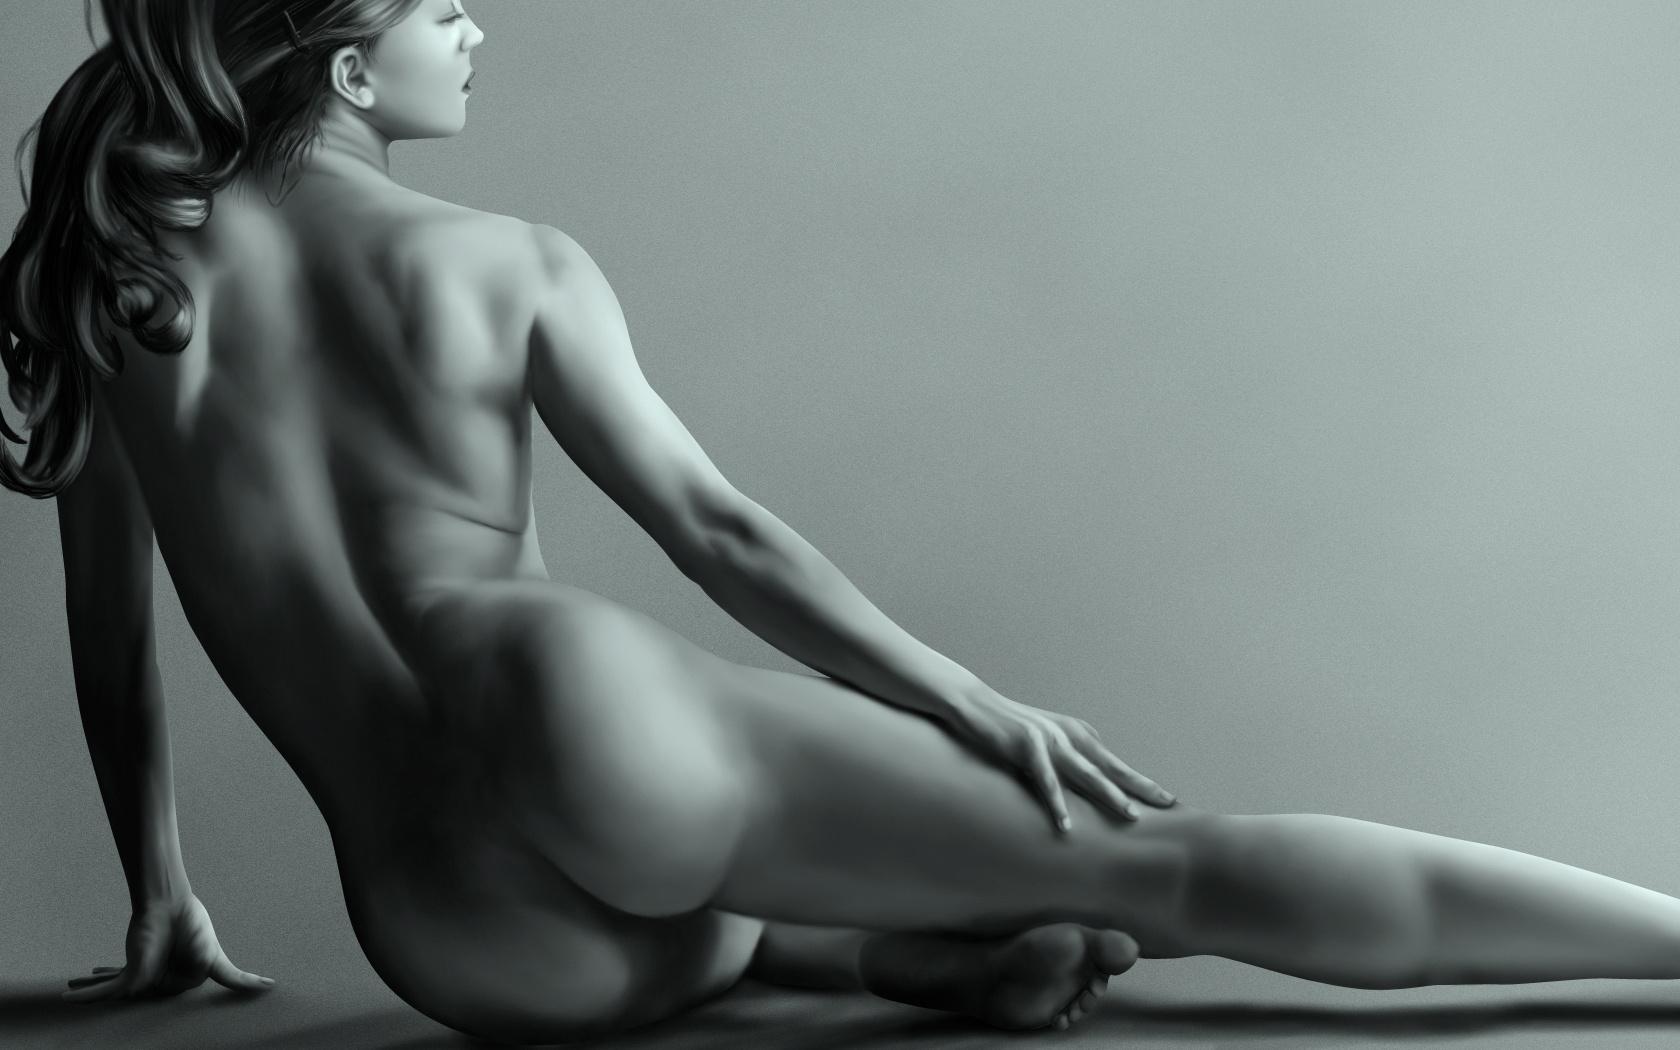 Hot artists nude